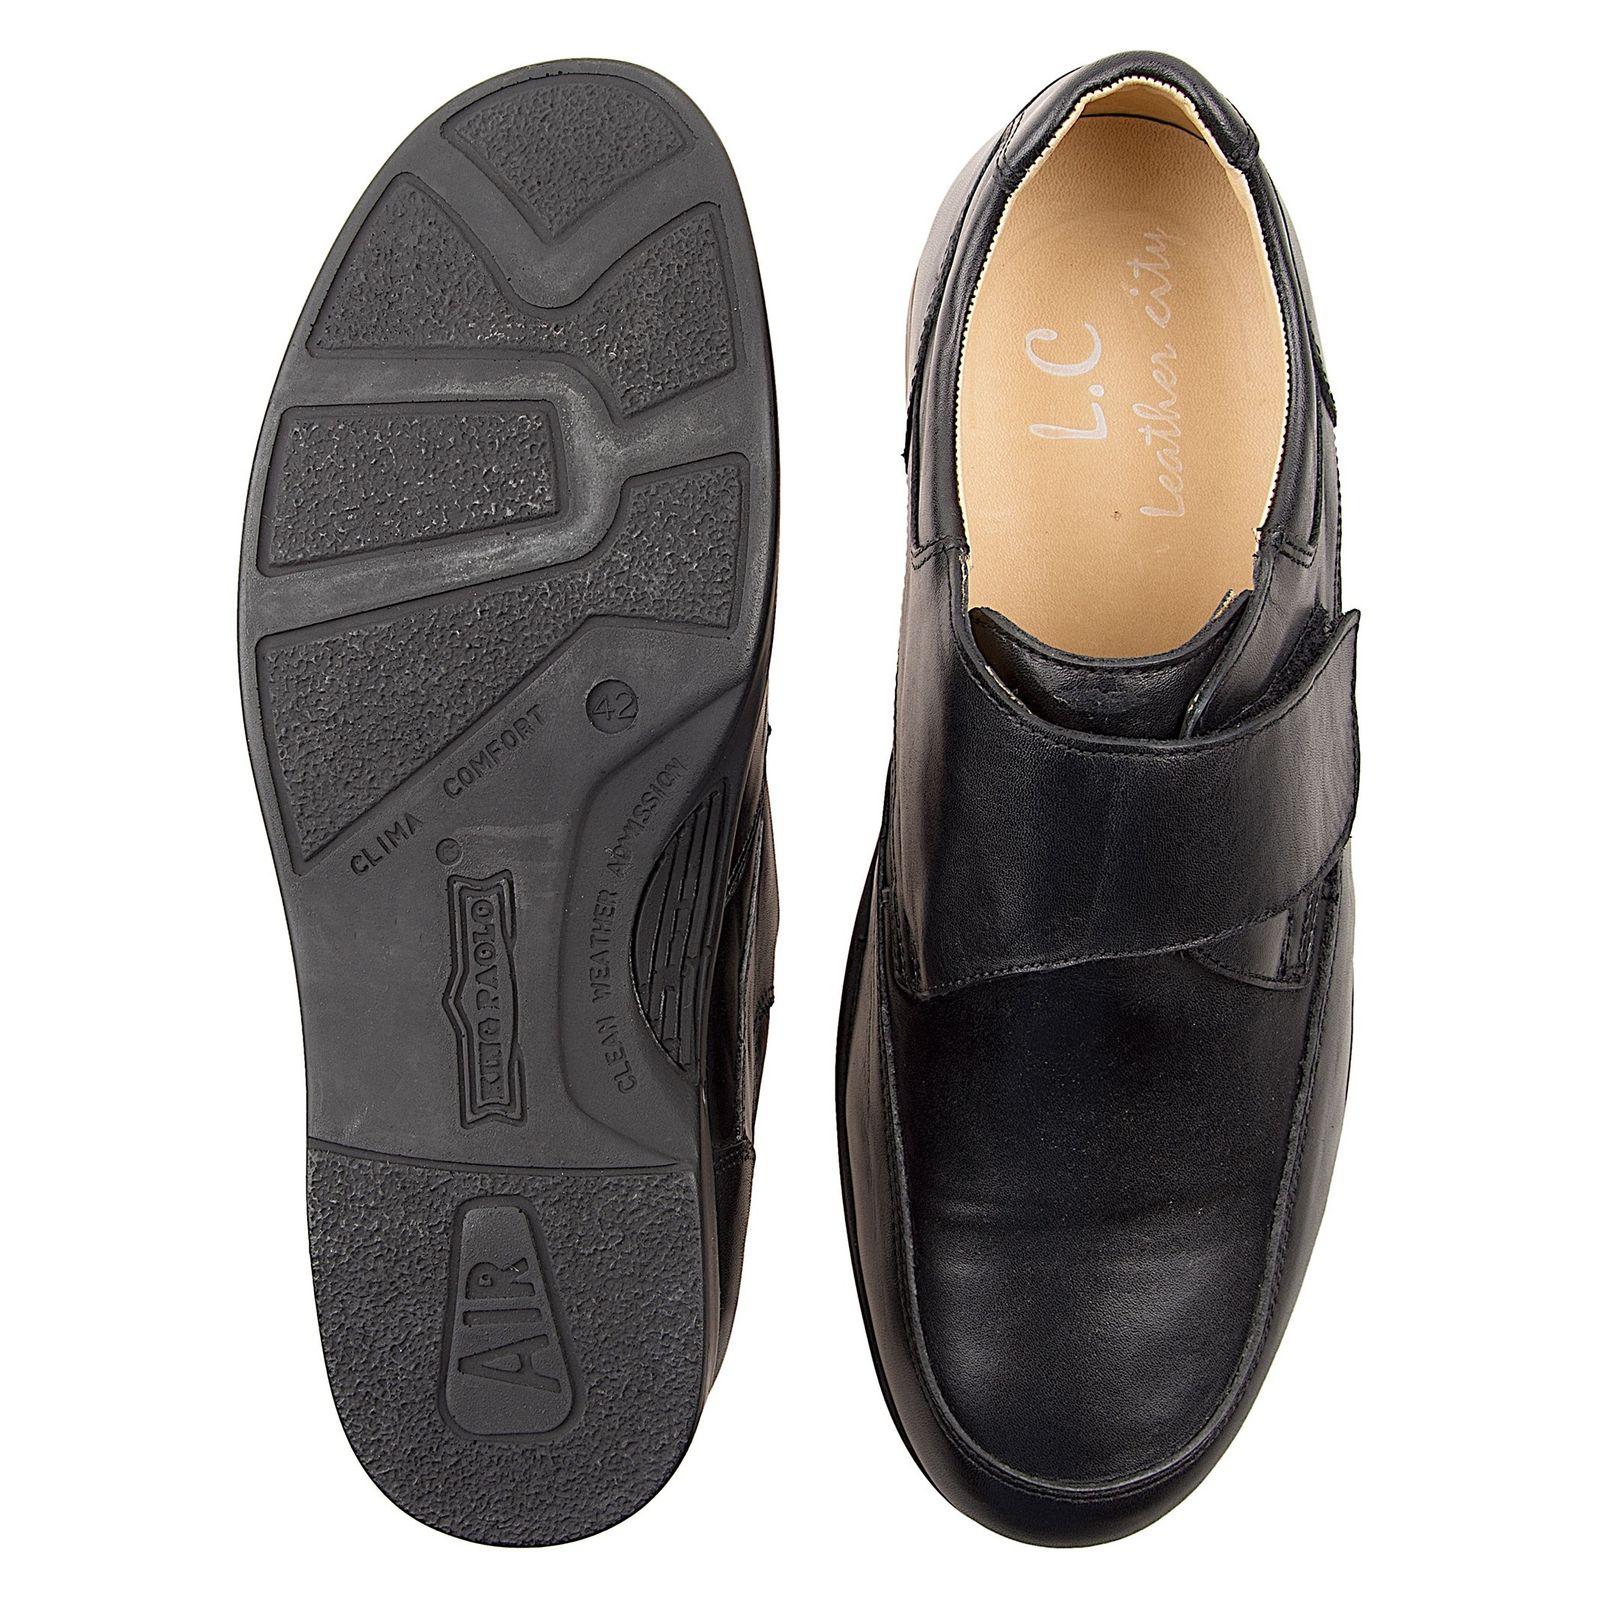 کفش اداری چرم مردانه - شهر چرم - مشکي - 2